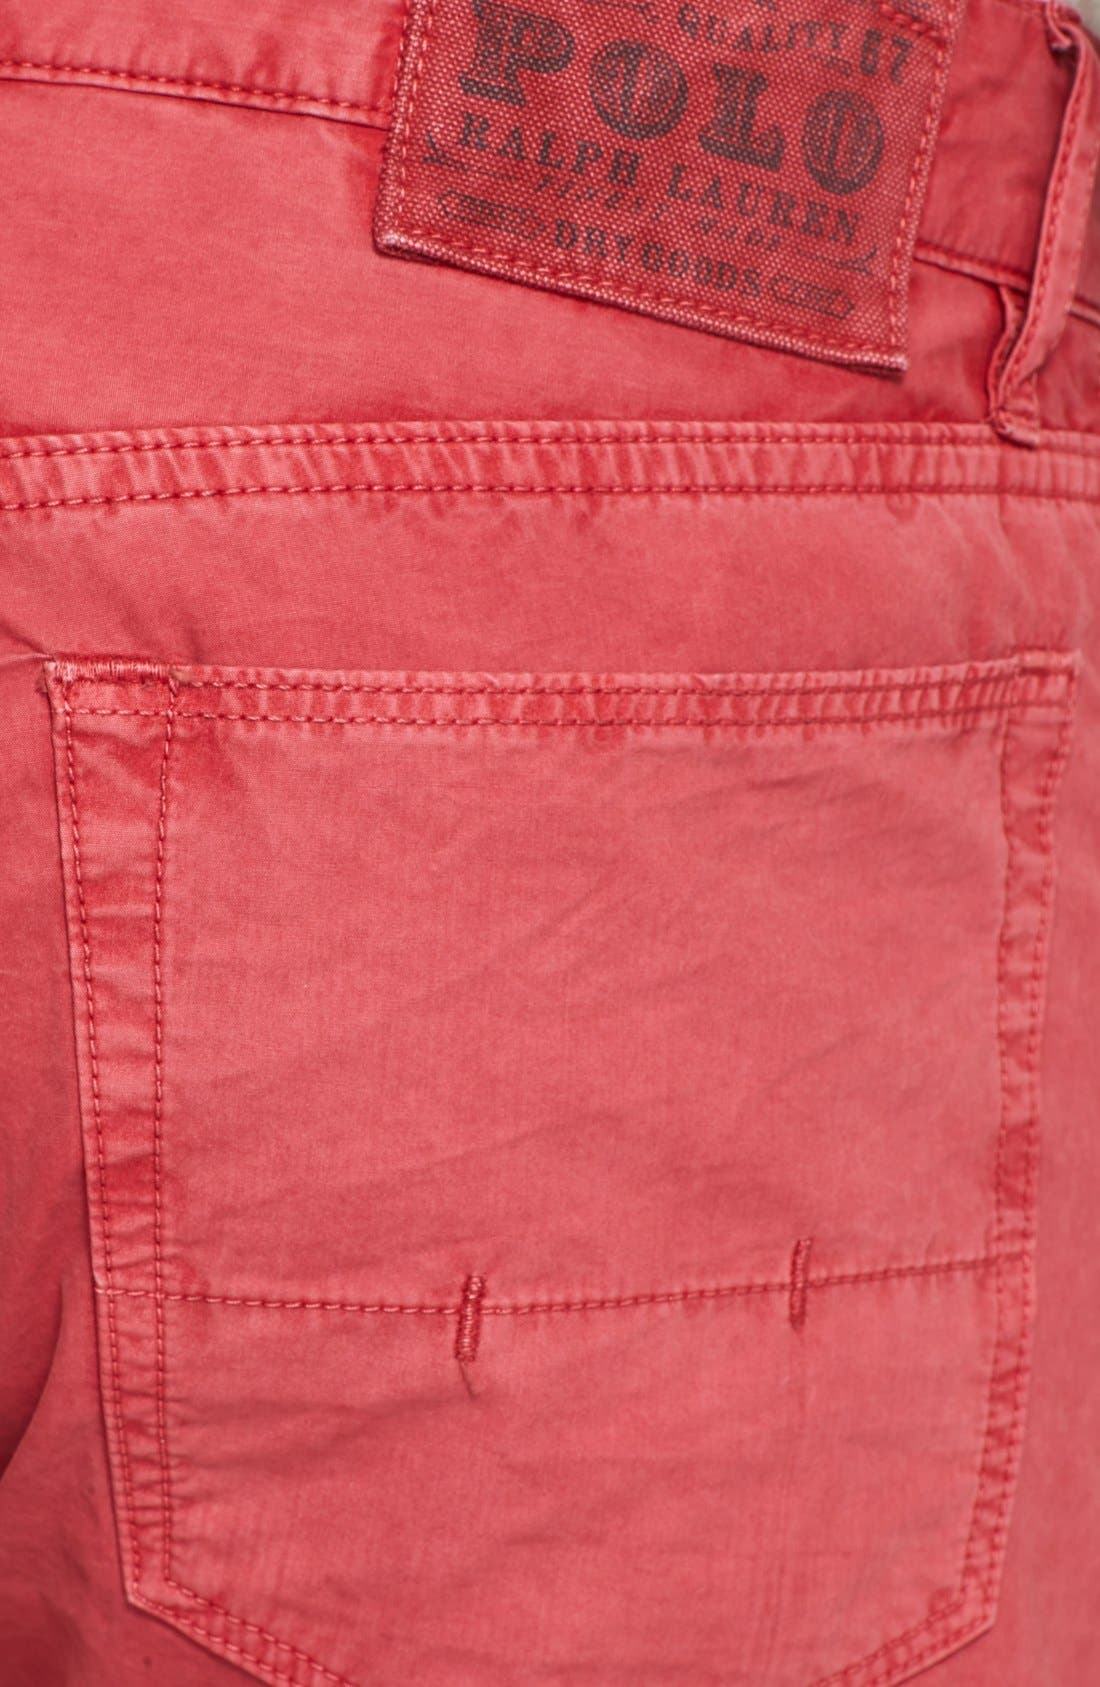 Alternate Image 3  - Polo Ralph Lauren Slim Fit Poplin Pants (Nantucket Red)